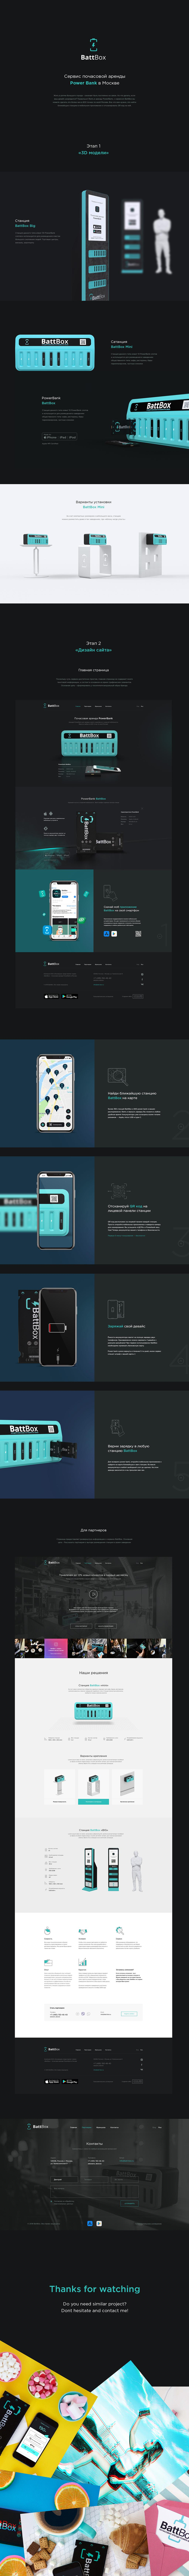 BattBox - почасовая аренда PowerBank